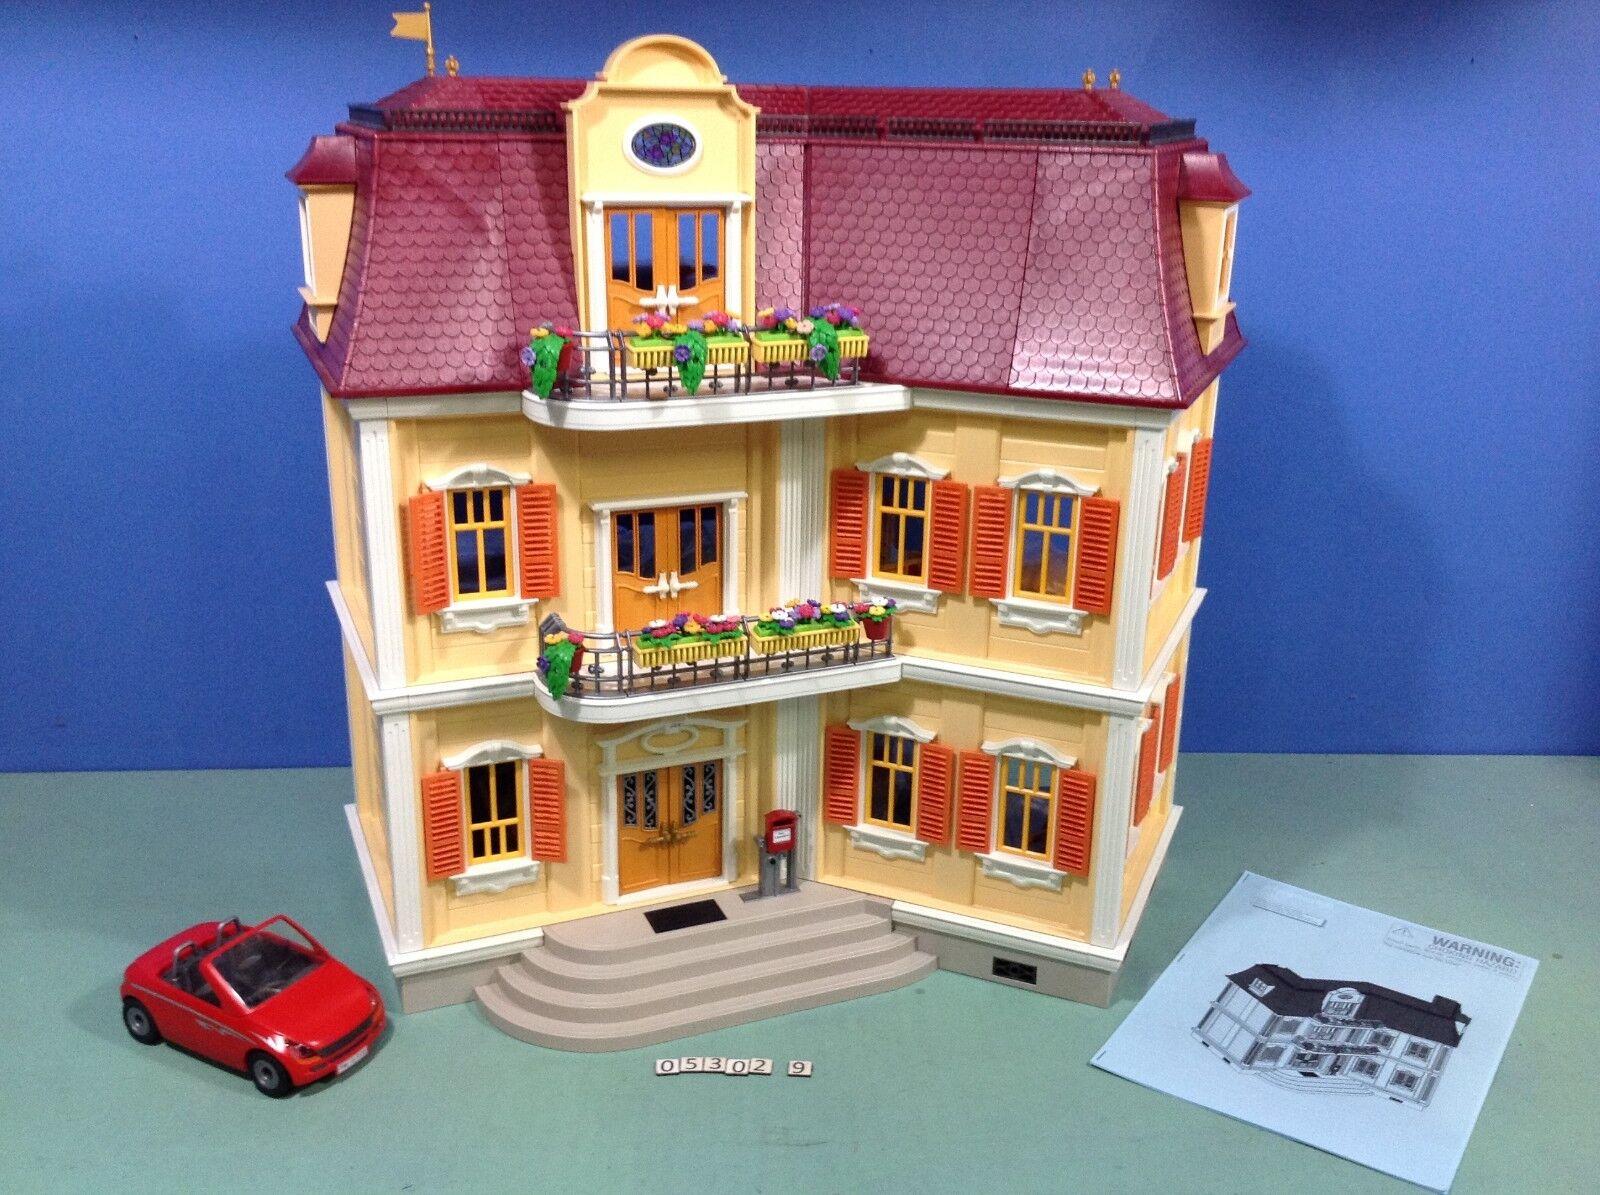 (O5302.9) playmobil Maison style 1900 ref 5302 5300 5305